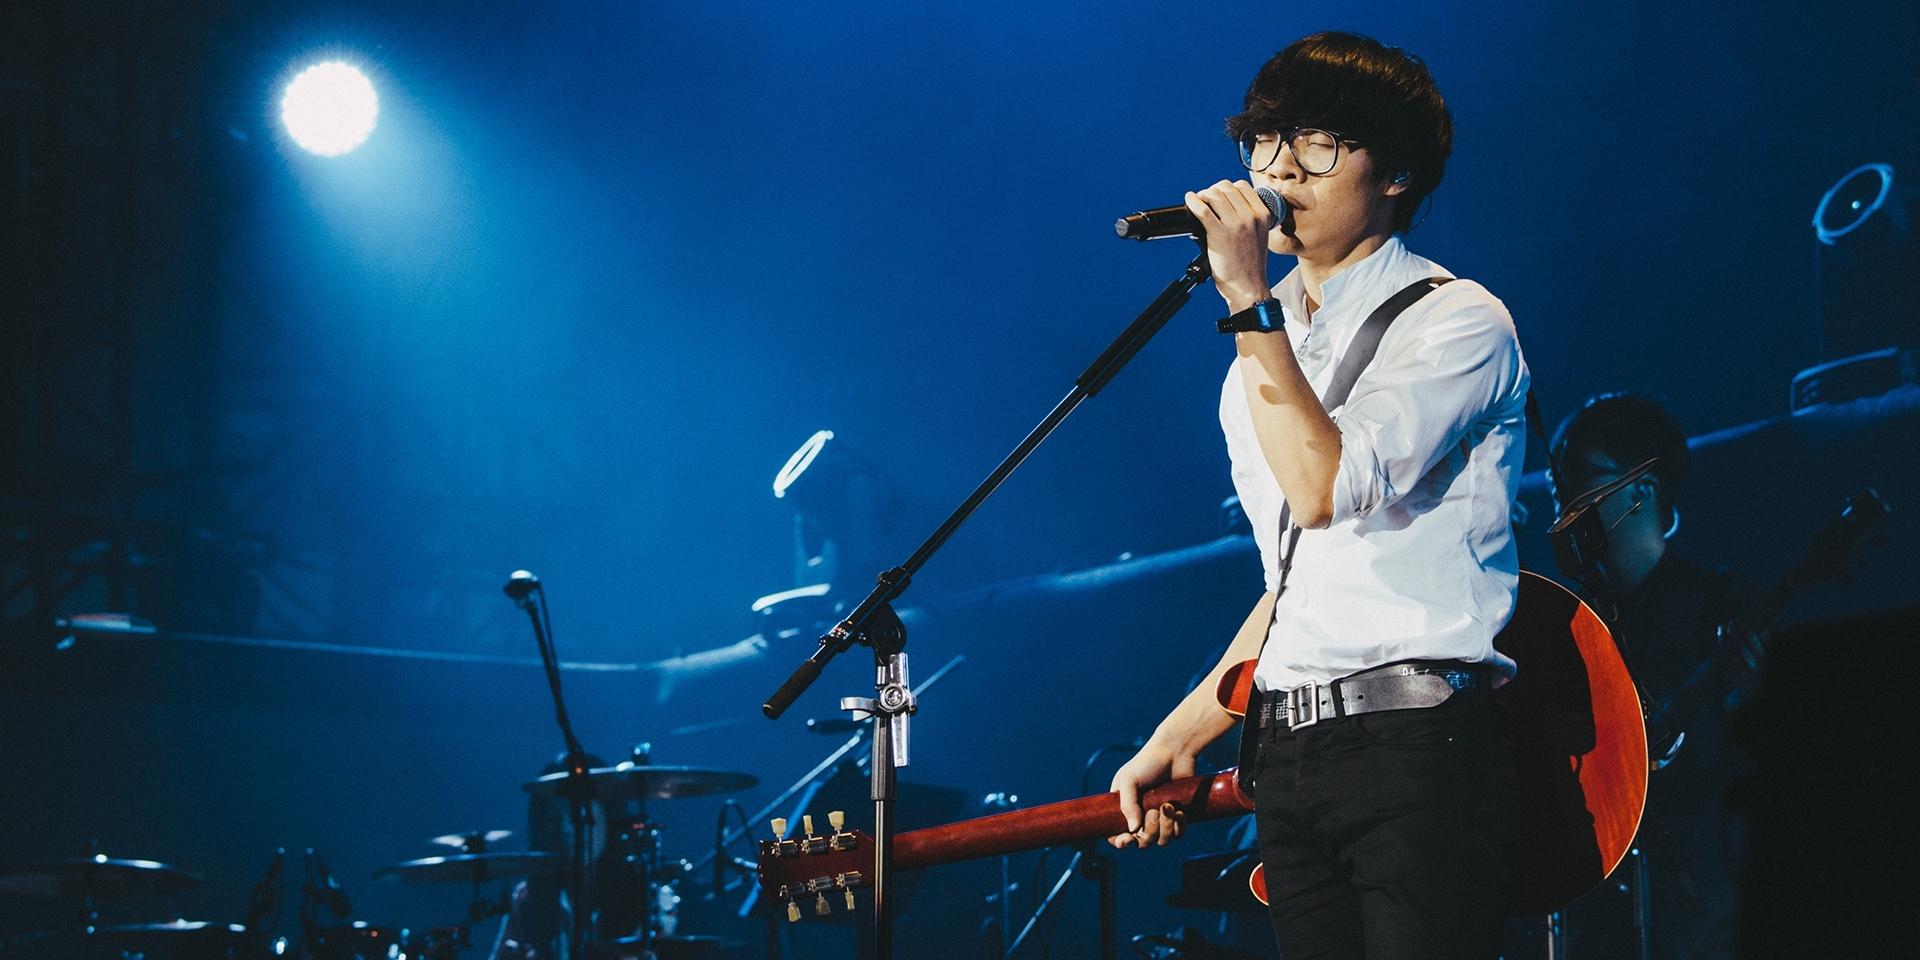 Crowd Lu卢广仲回顾十年音乐生涯:最骄傲的是每天都吃早餐!